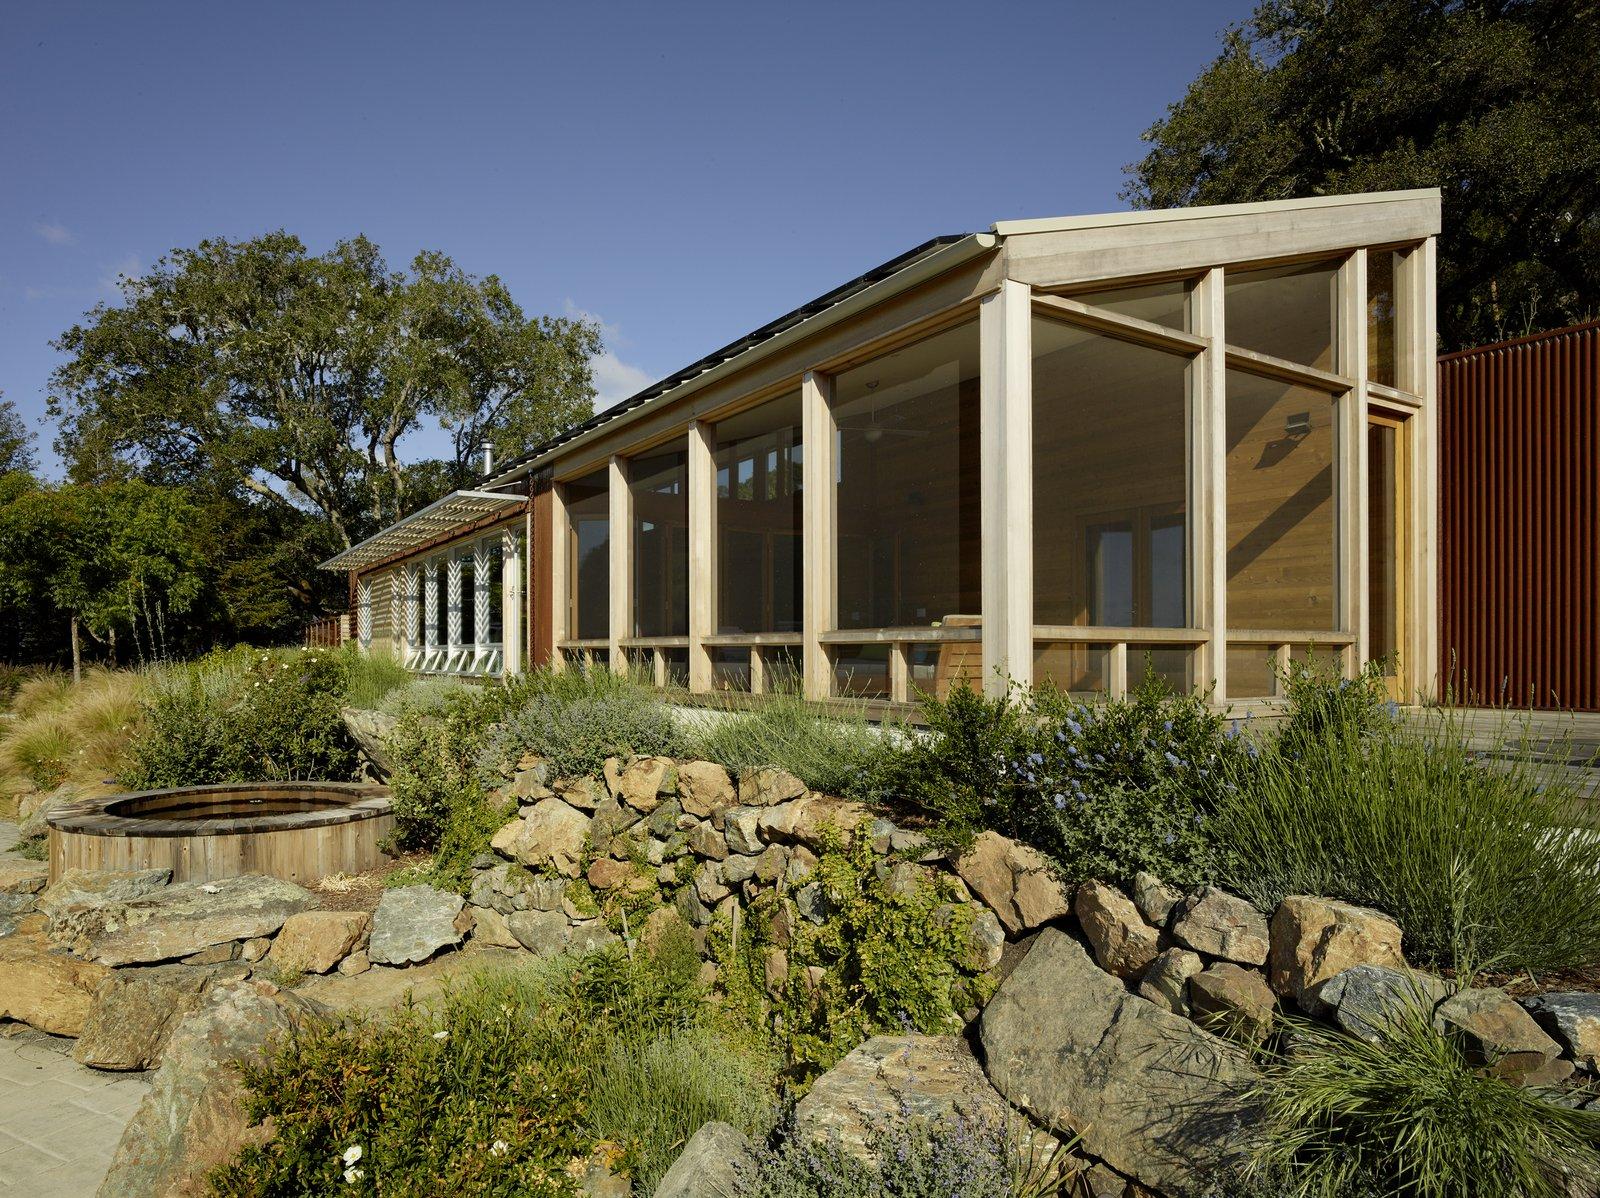 #TurnbullGriffinHaesloop #exterior #landscape #hottub #screenedporch  Cloverdale Residence by Turnbull Griffin Haesloop Architects